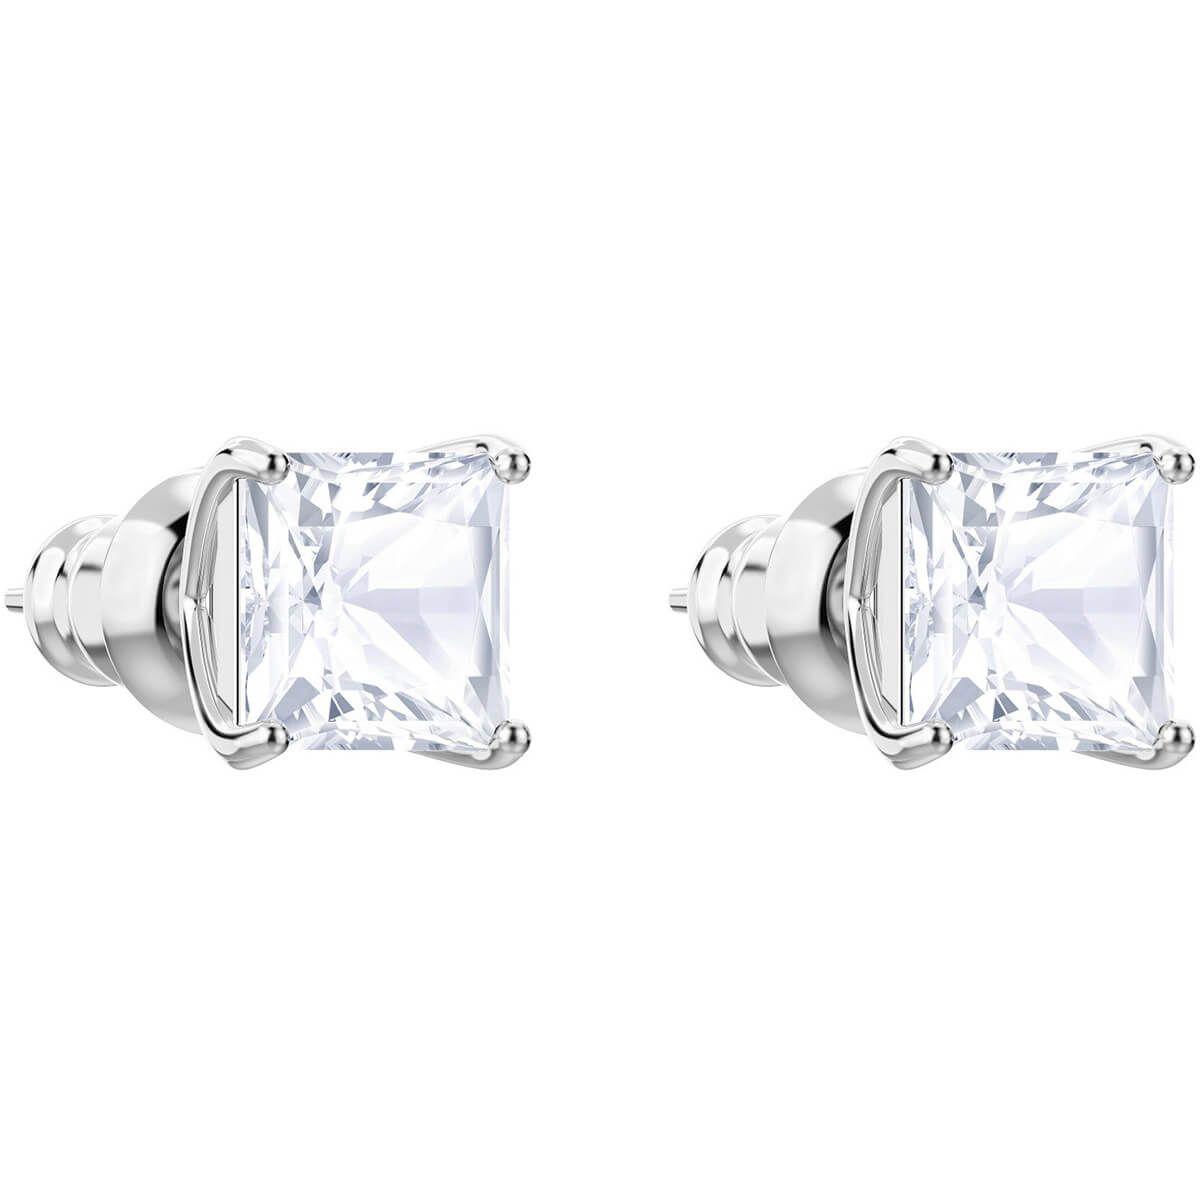 1fff9108d Attract Stud Pierced Earrings, White, Rhodium plating | jewelry ...